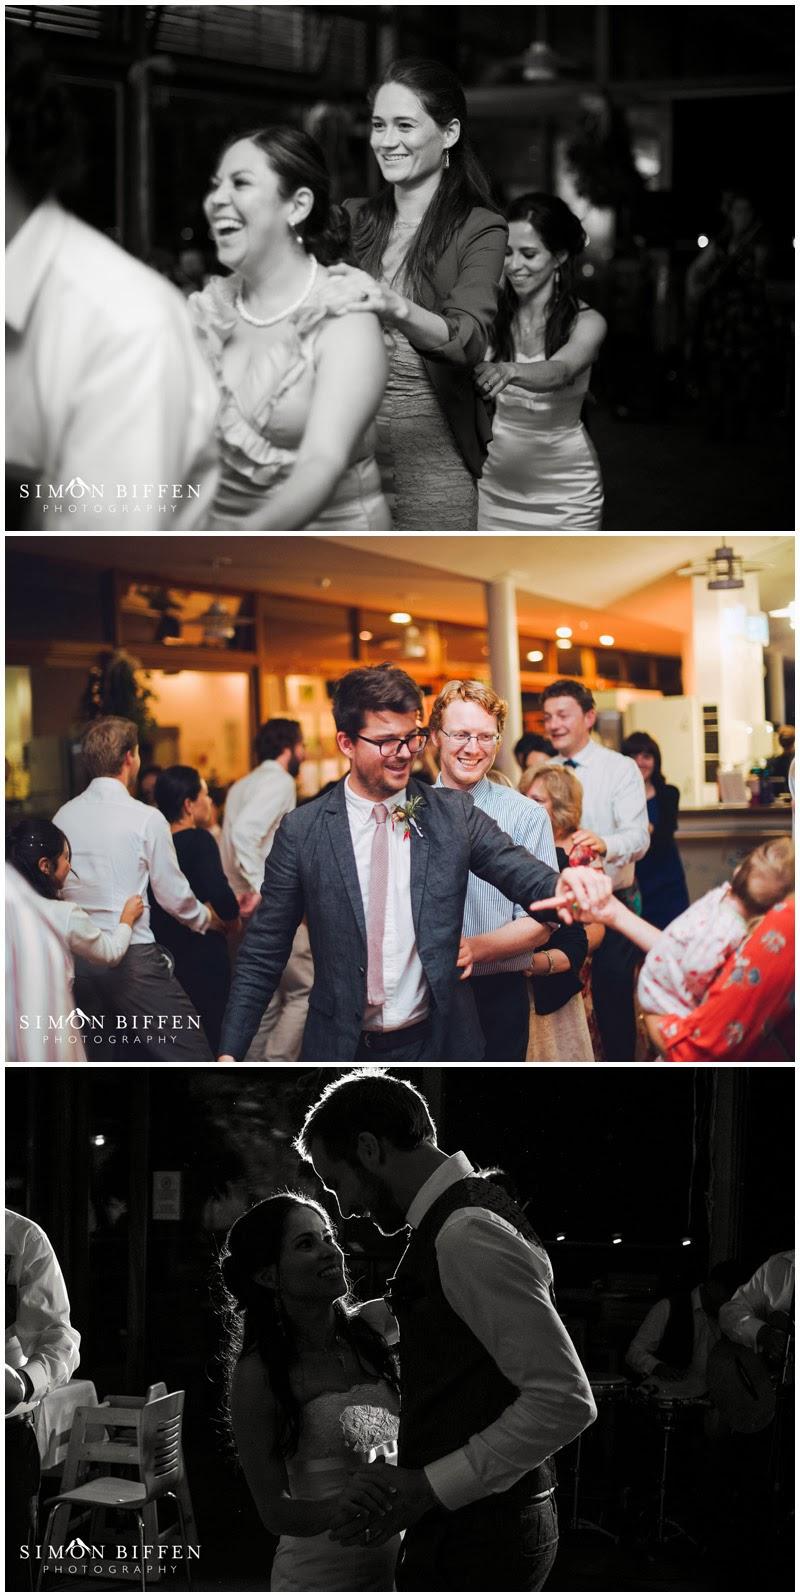 Wedding dancing at Sir Harold Hillier Gardens